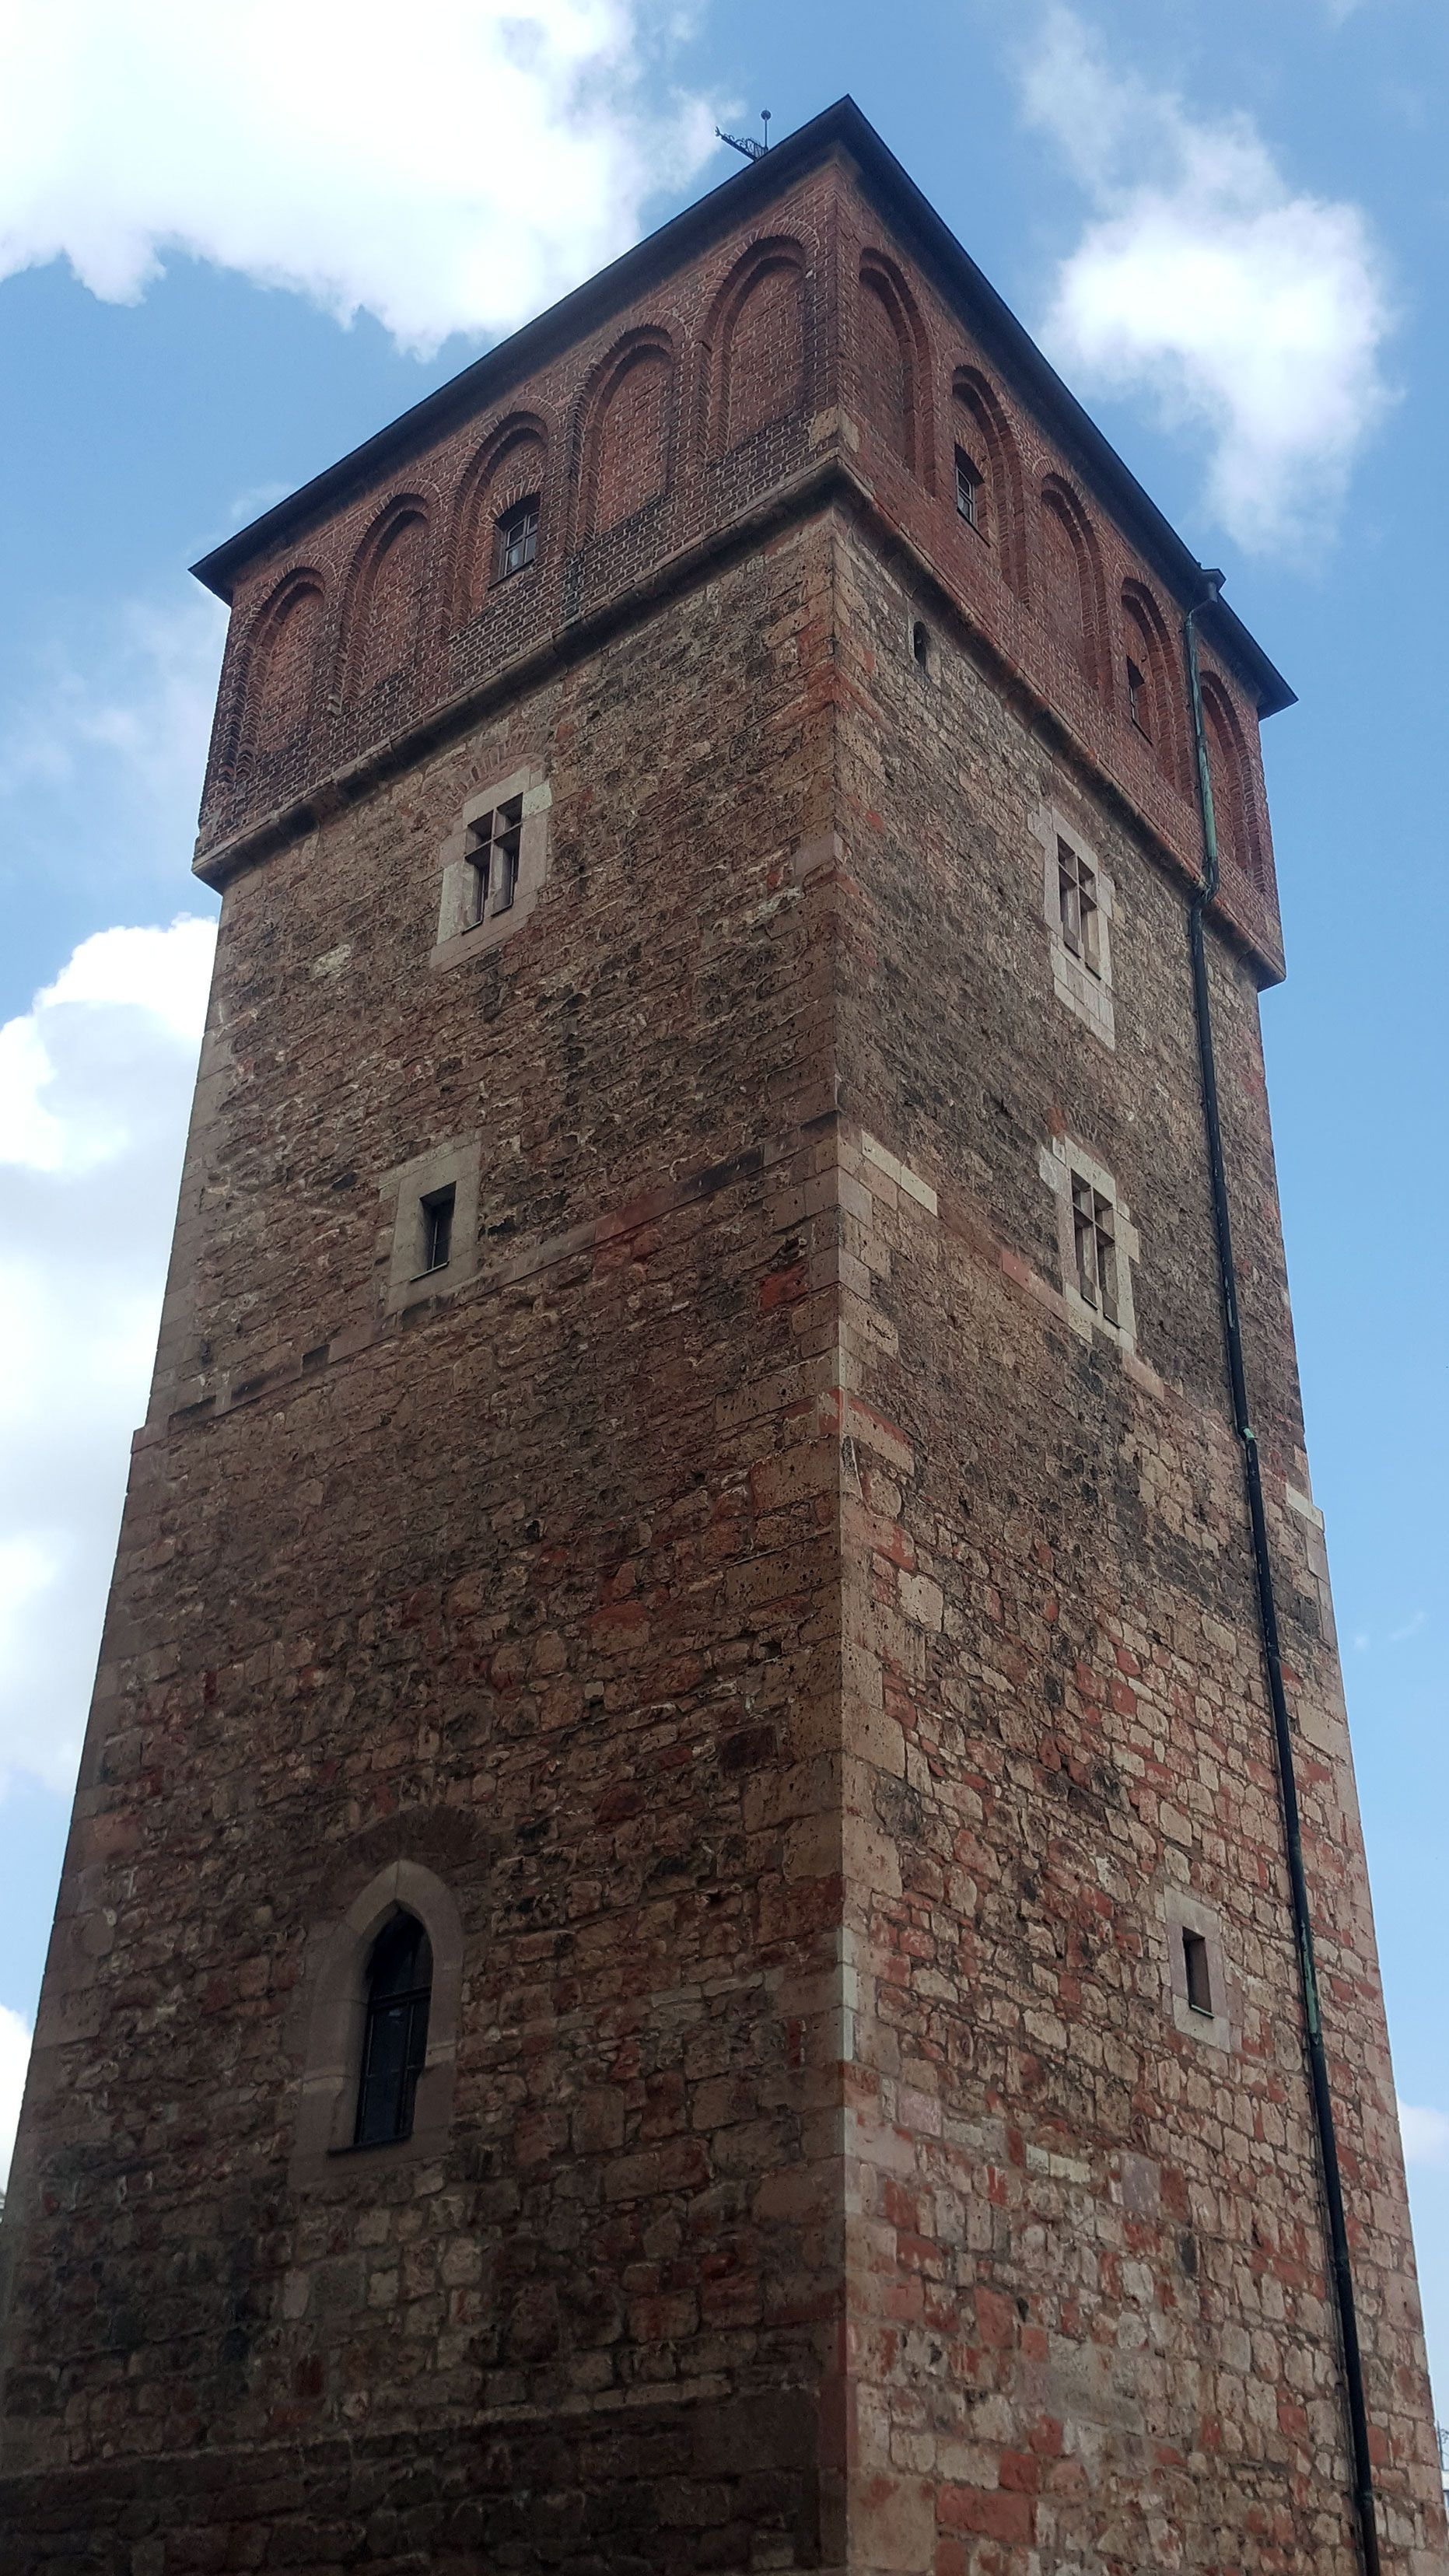 Roter Turm Chemnitz Chemnitz Karl Marx Stadt Roter Turm